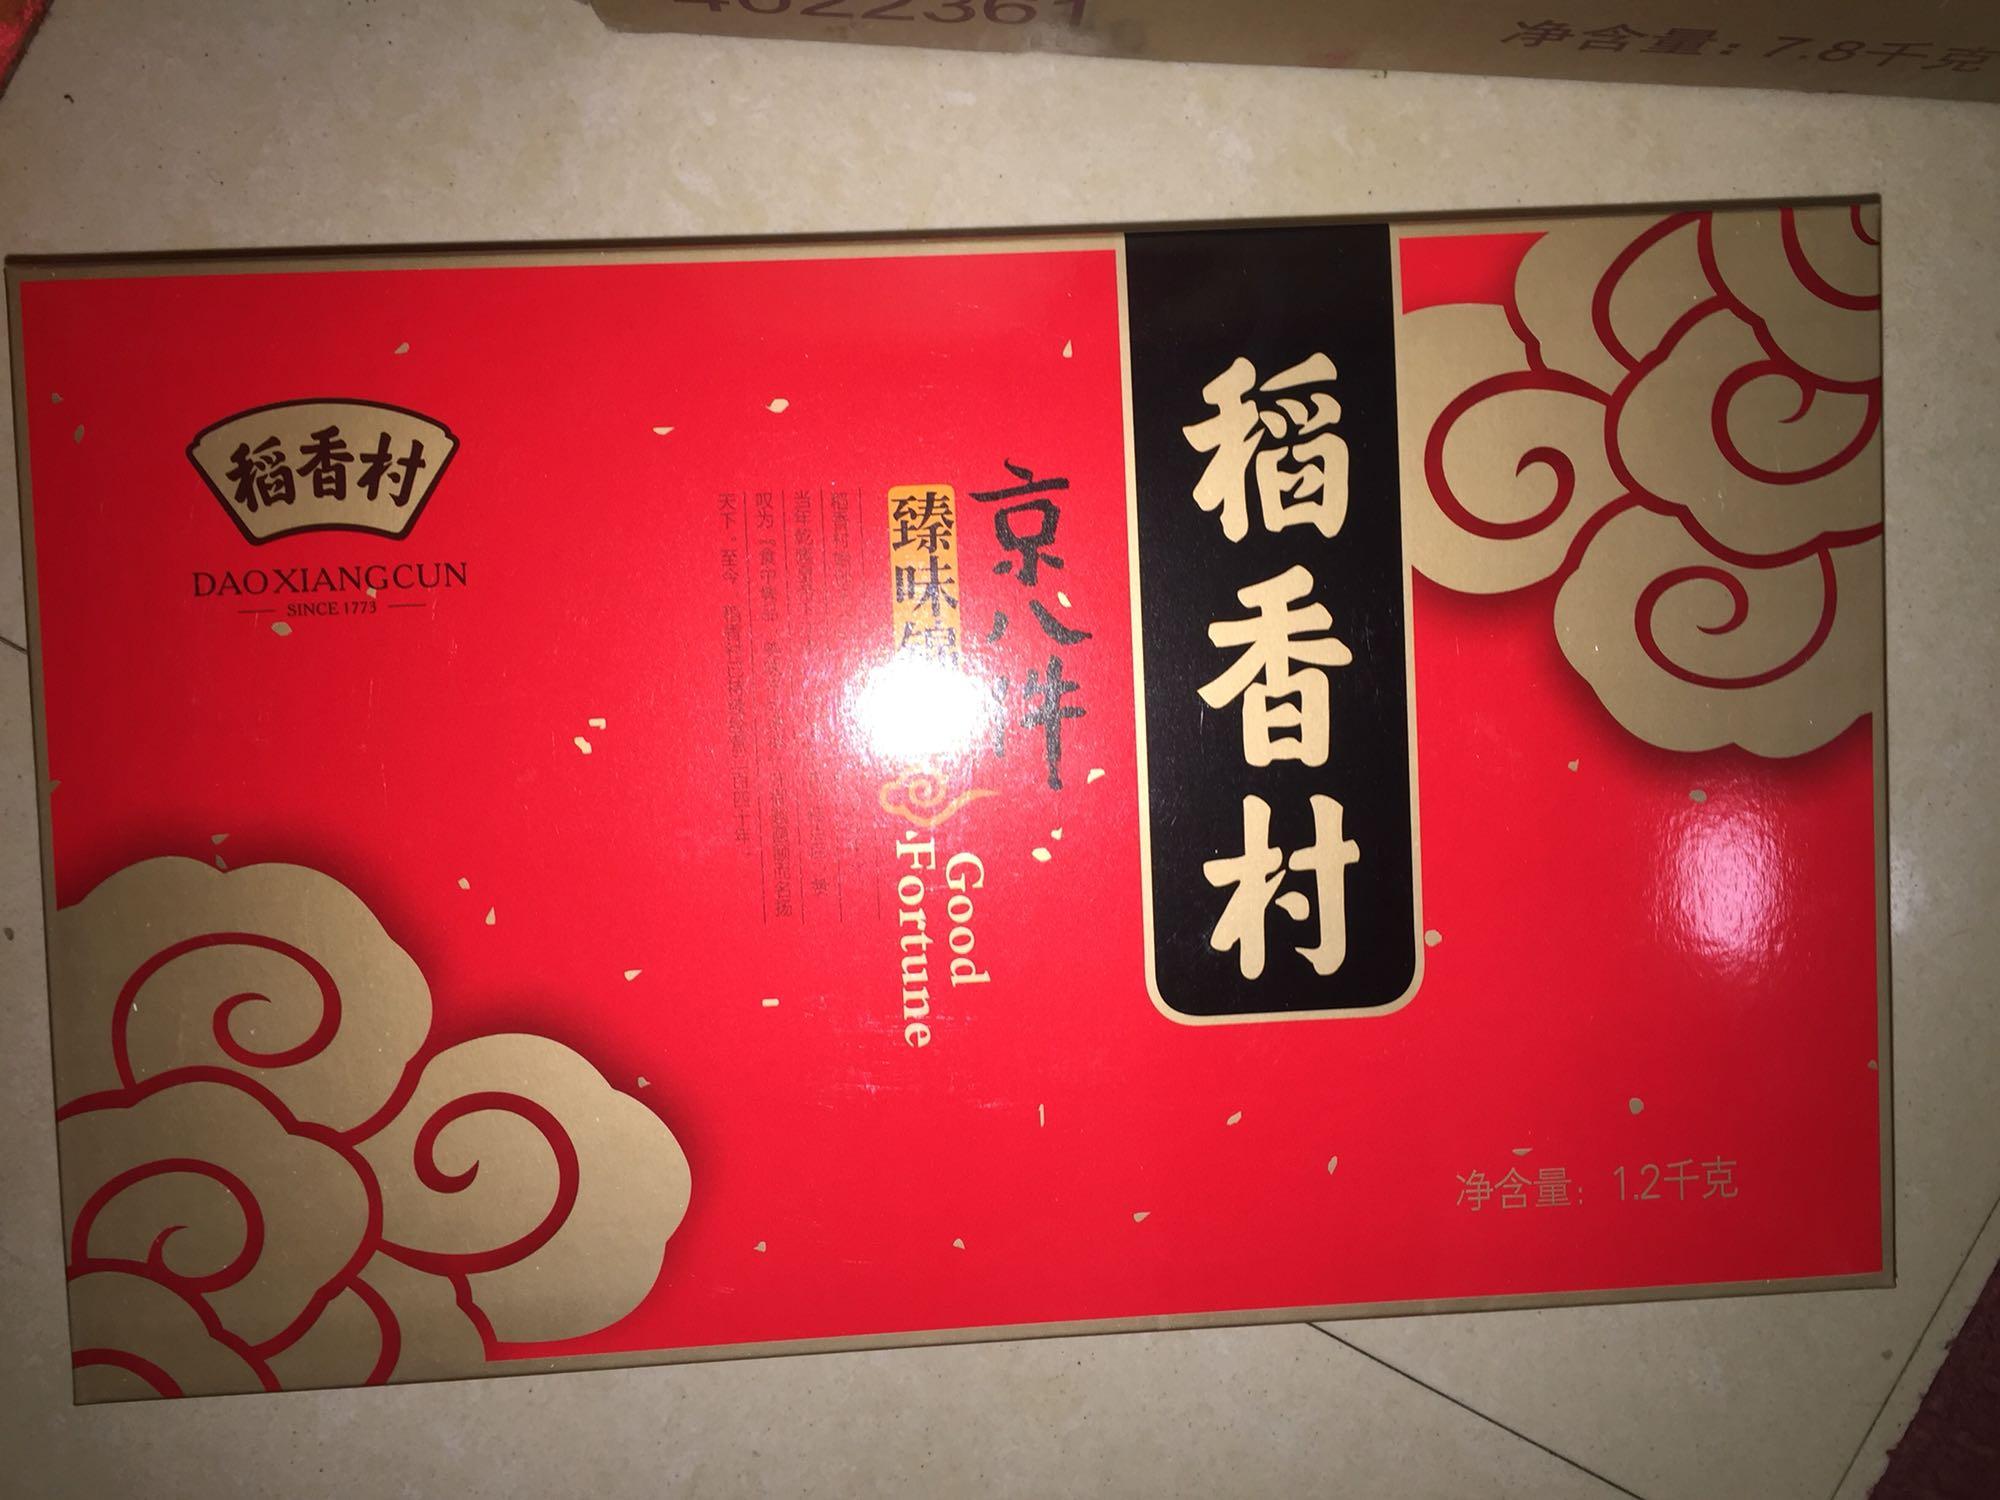 china wholesale jordans free shipping paypal 00928341 real